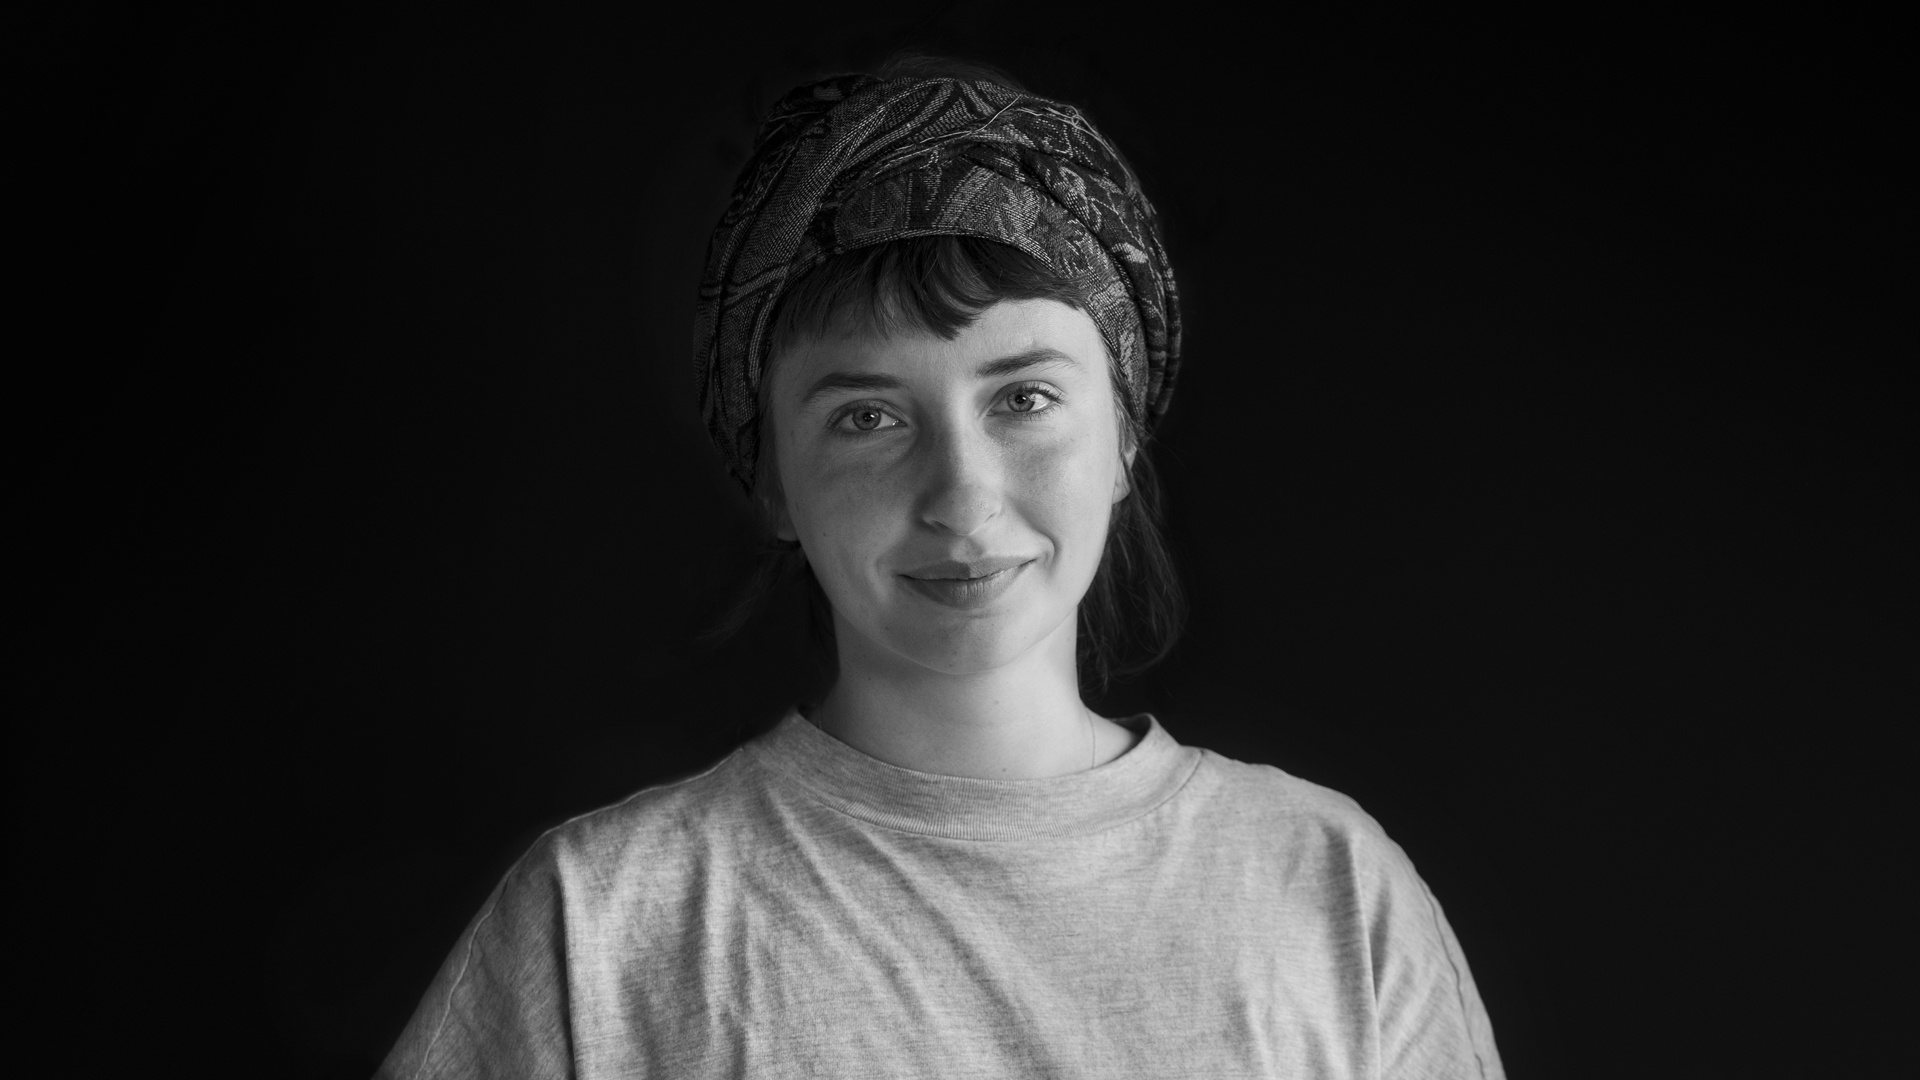 Sarah Eschbach